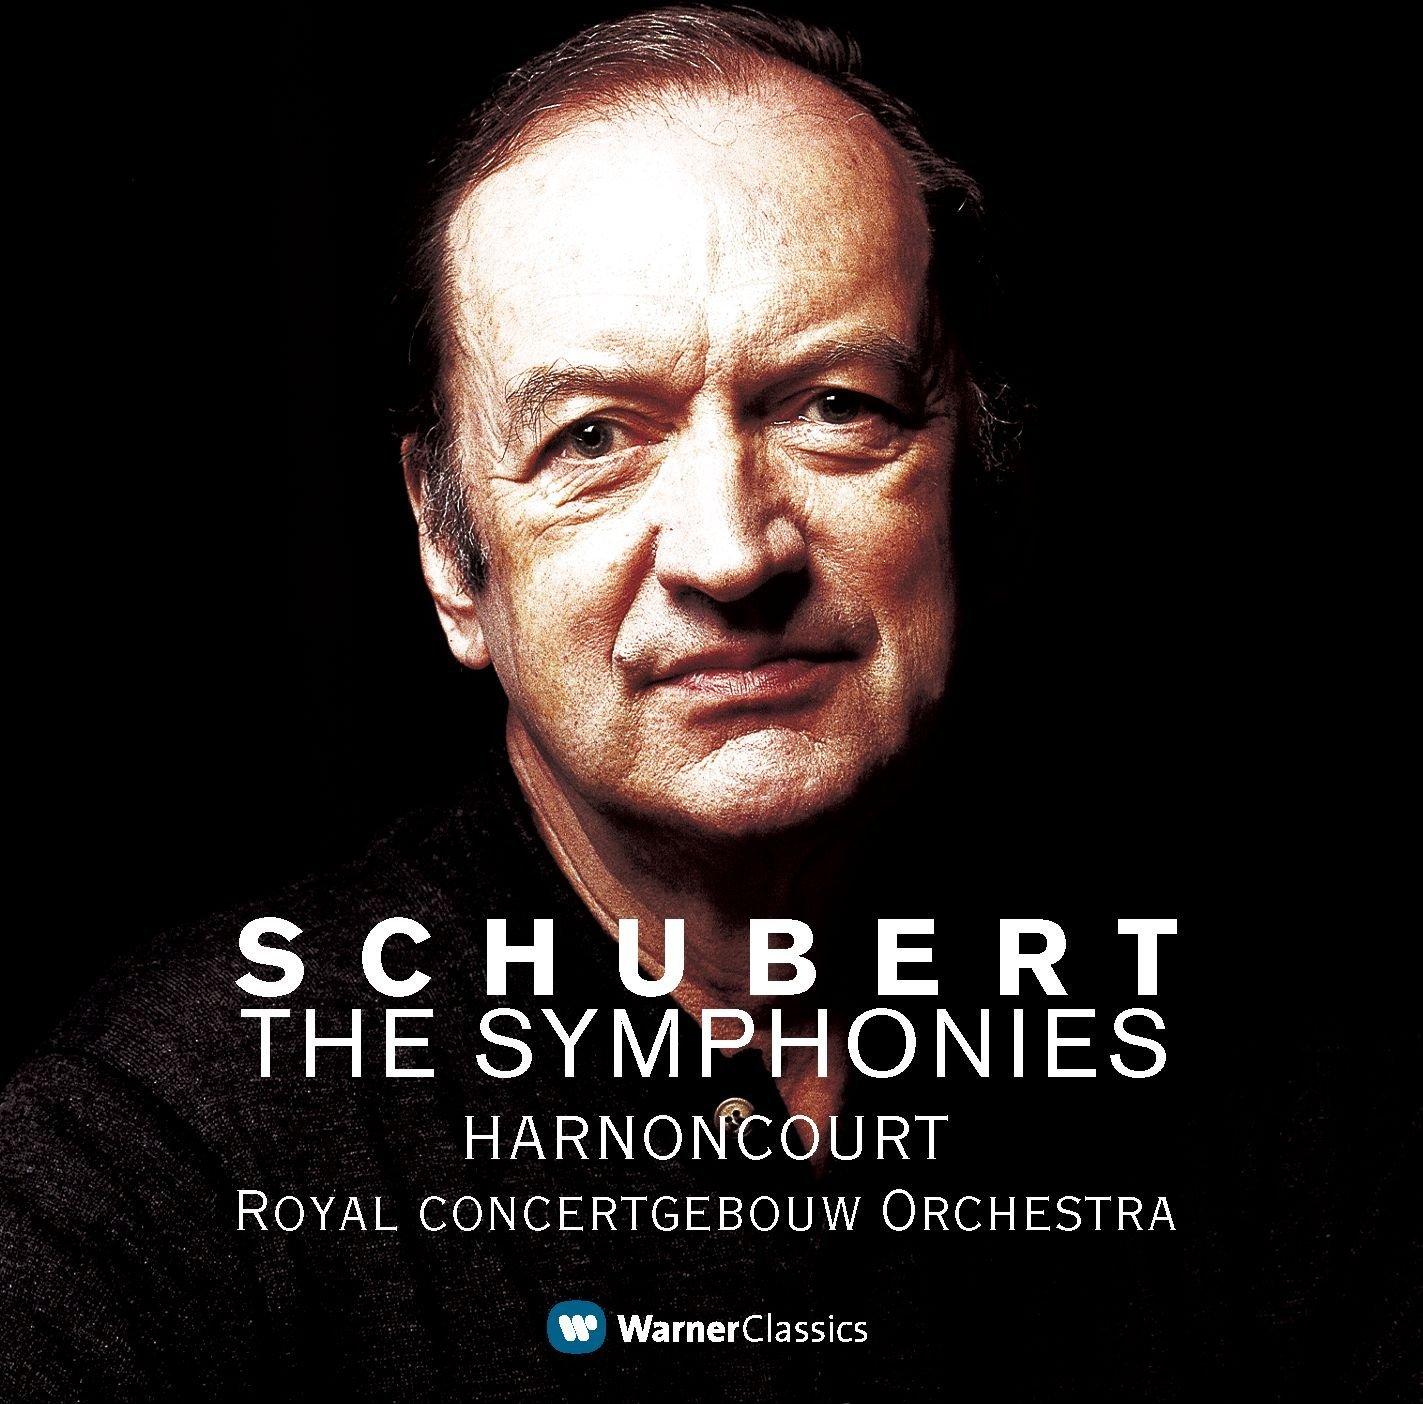 Franz schubert symphonie 8 - 5 3